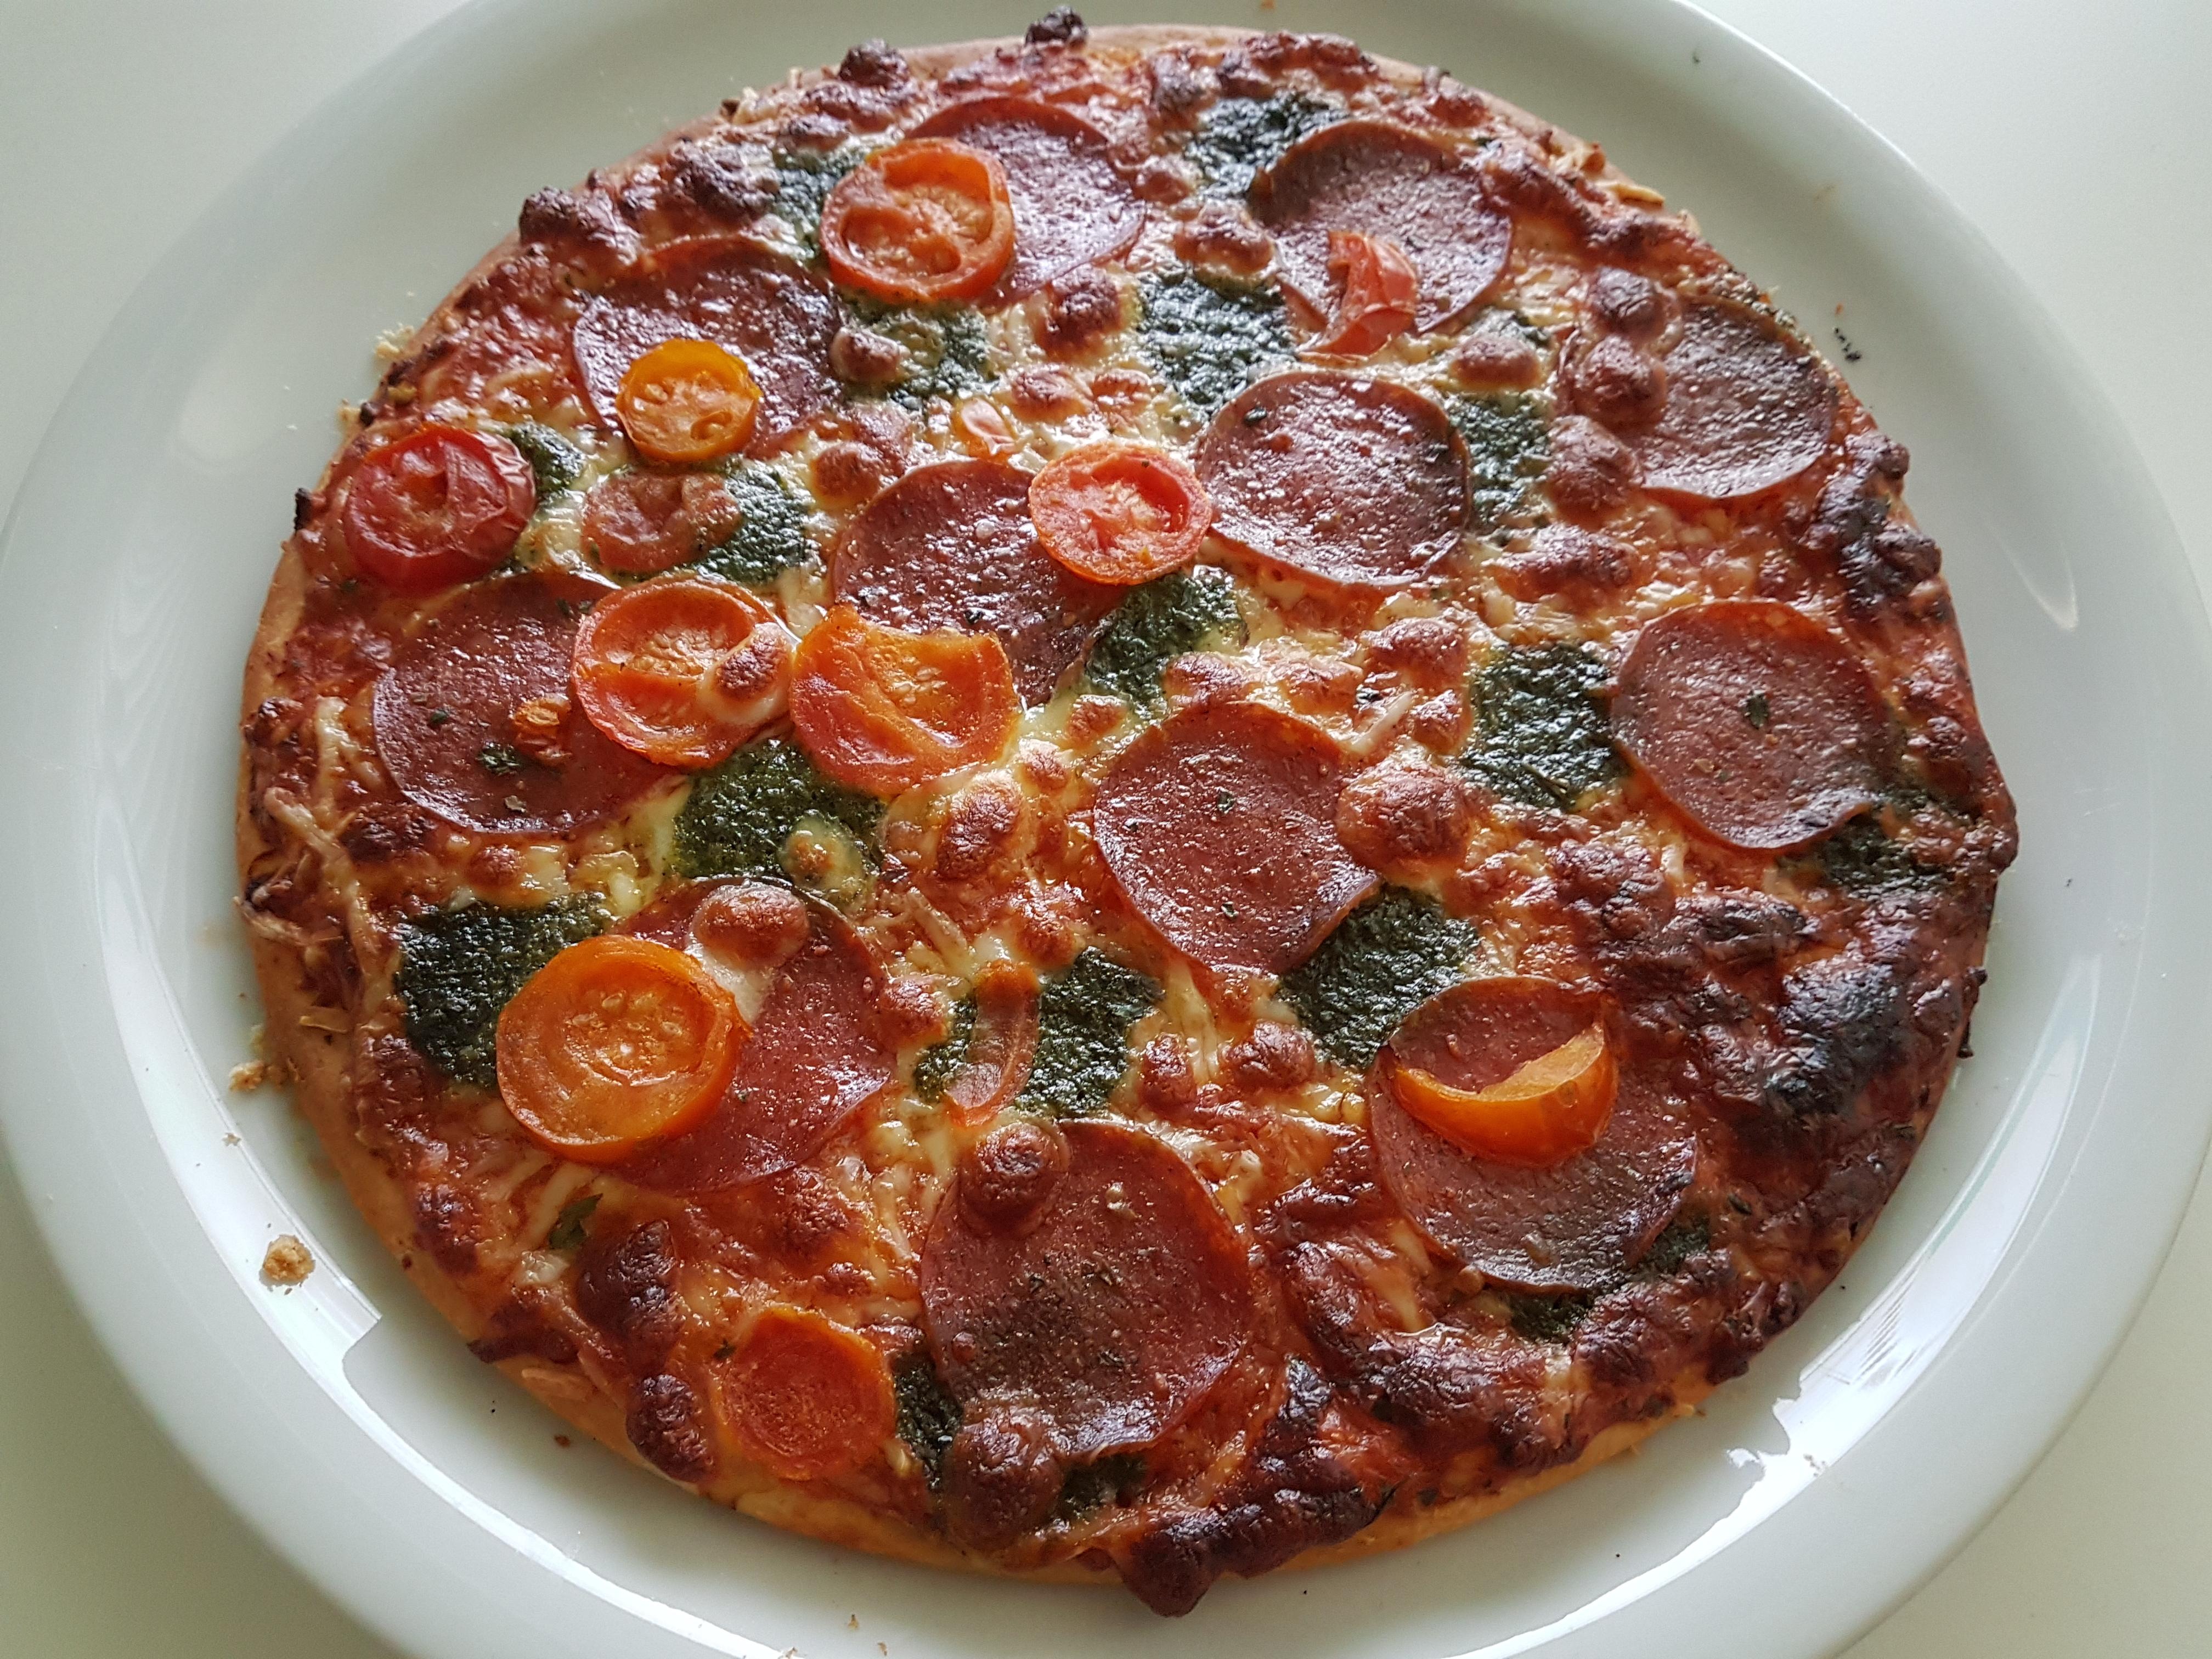 http://foodloader.net/Holz_2017-06-05_Pizza.jpg